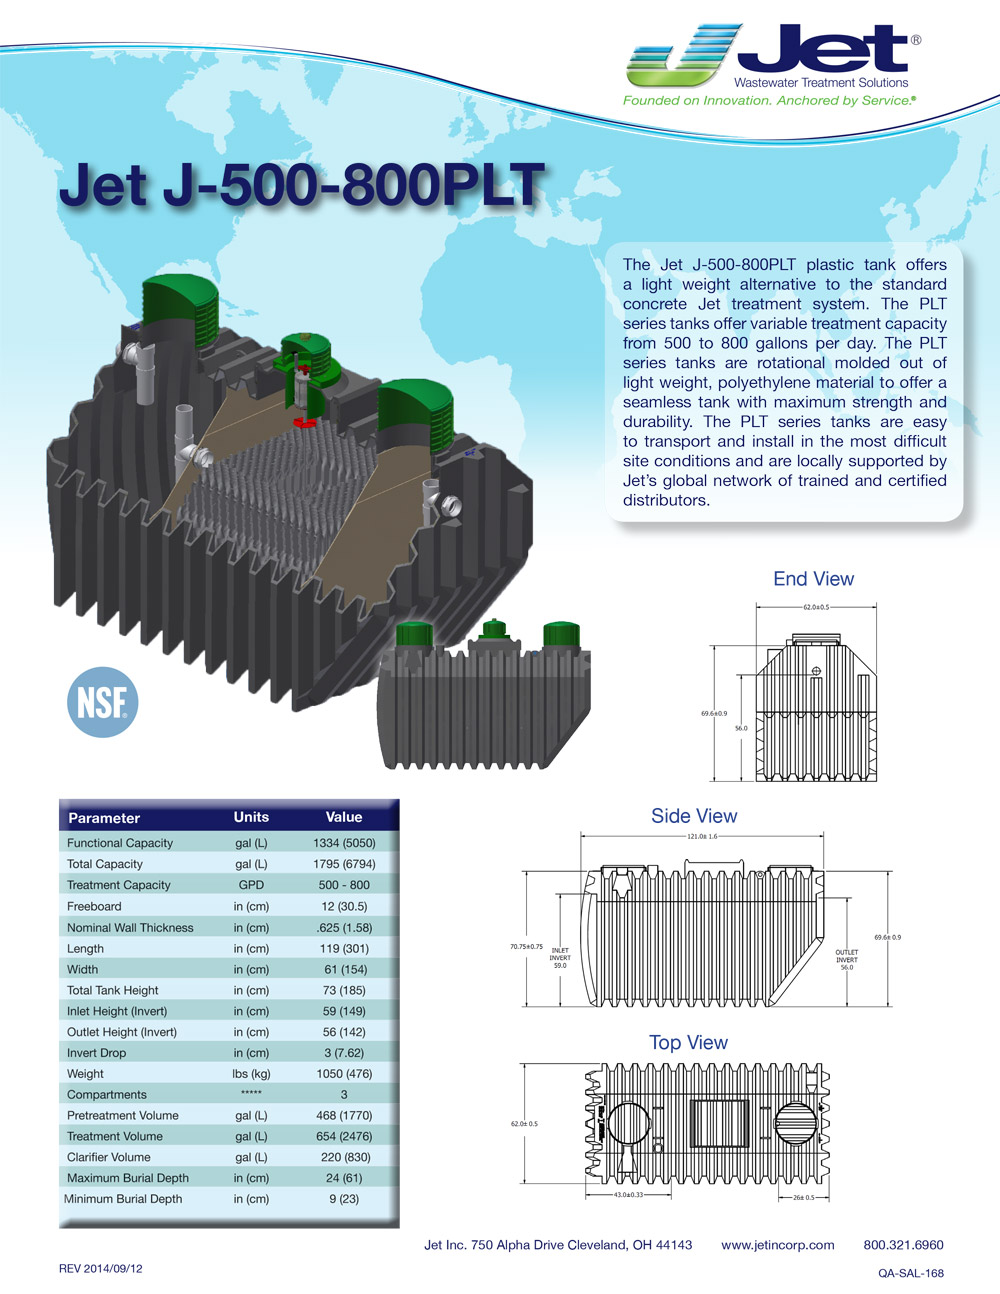 Jet J-500-800PLT document img